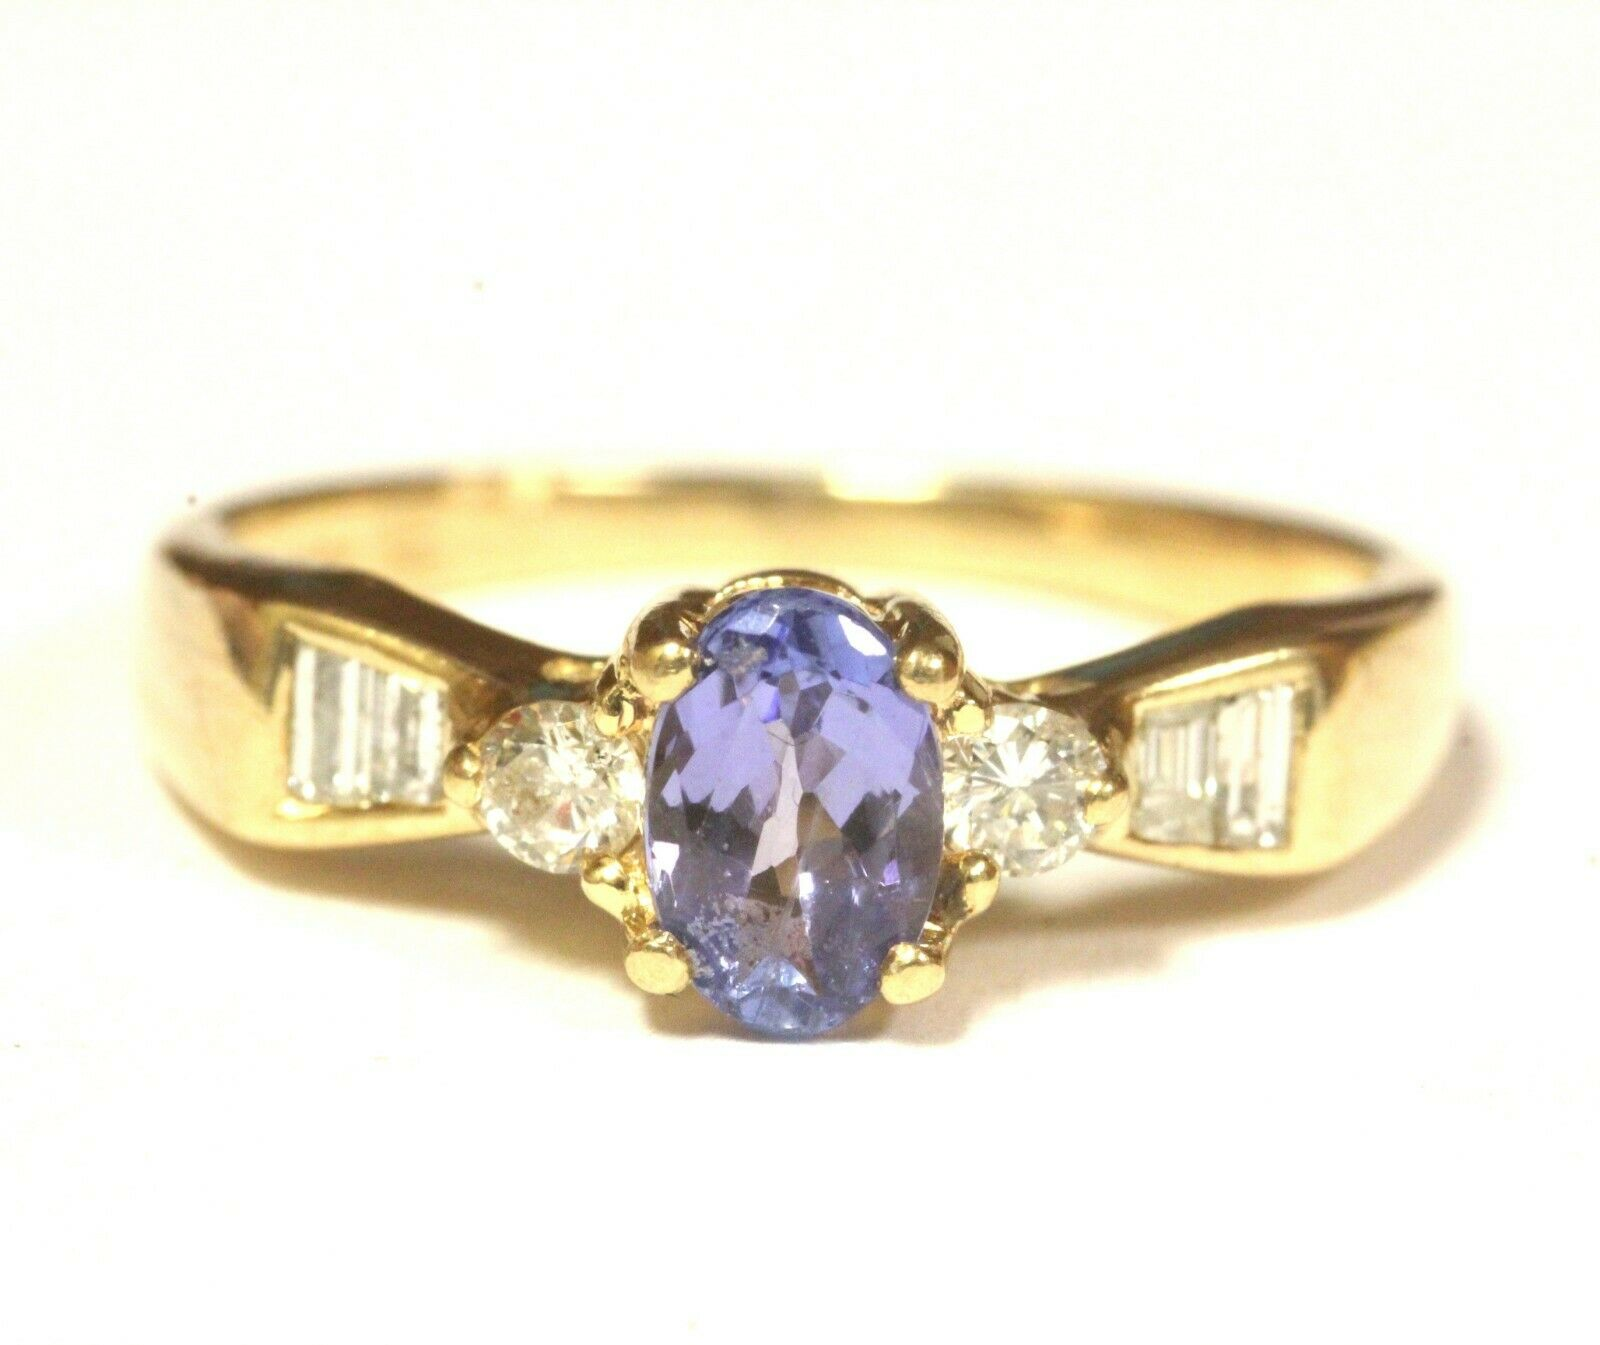 14k yellow gold .10ct SI1 G diamond oval tanzanite ring 2.4g estate womens